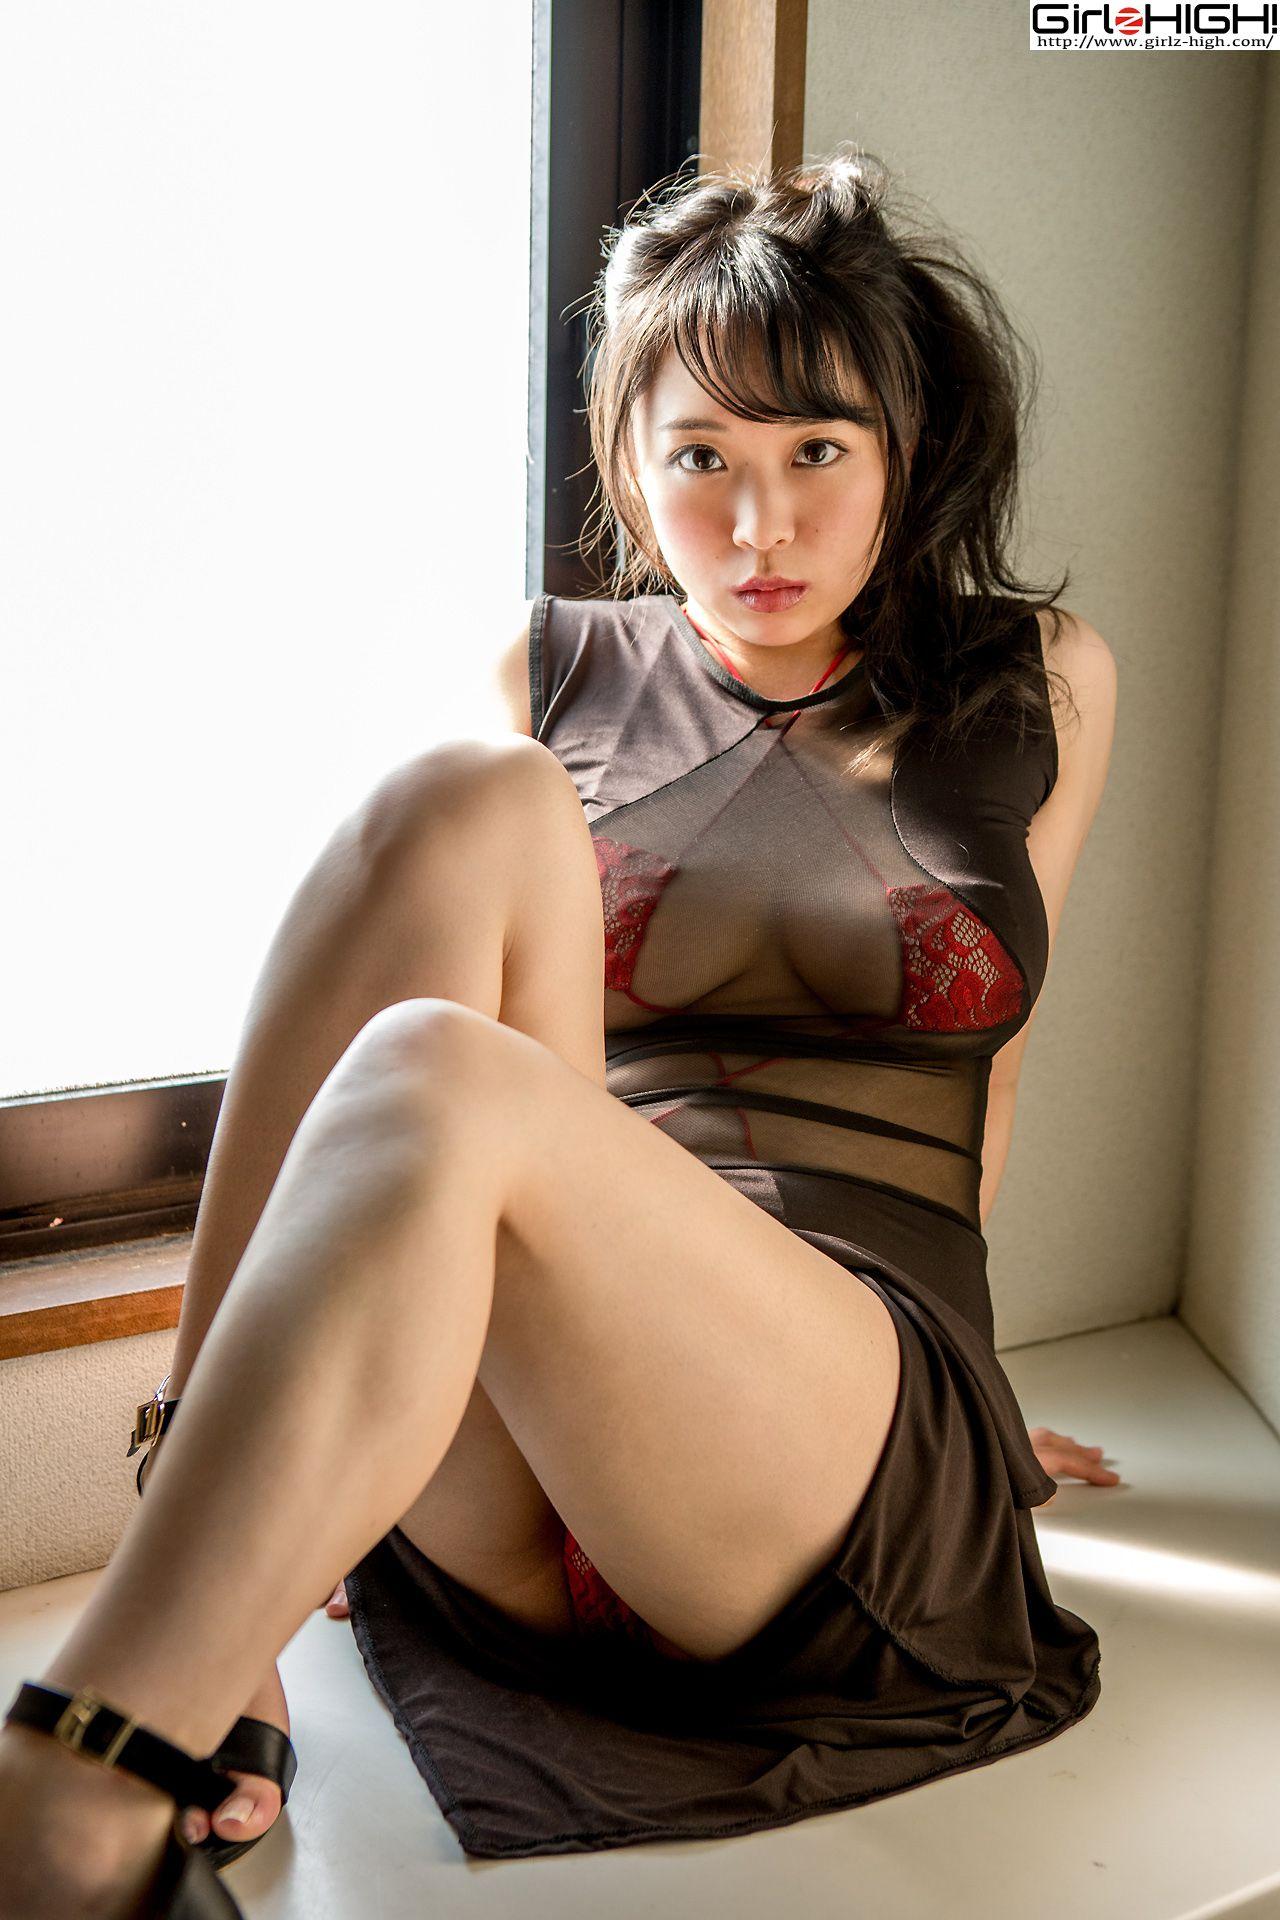 VOL.106 [Girlz-High]福利浴室美乳:优美(ゆうみYuumi)超高清写真套图(35P)